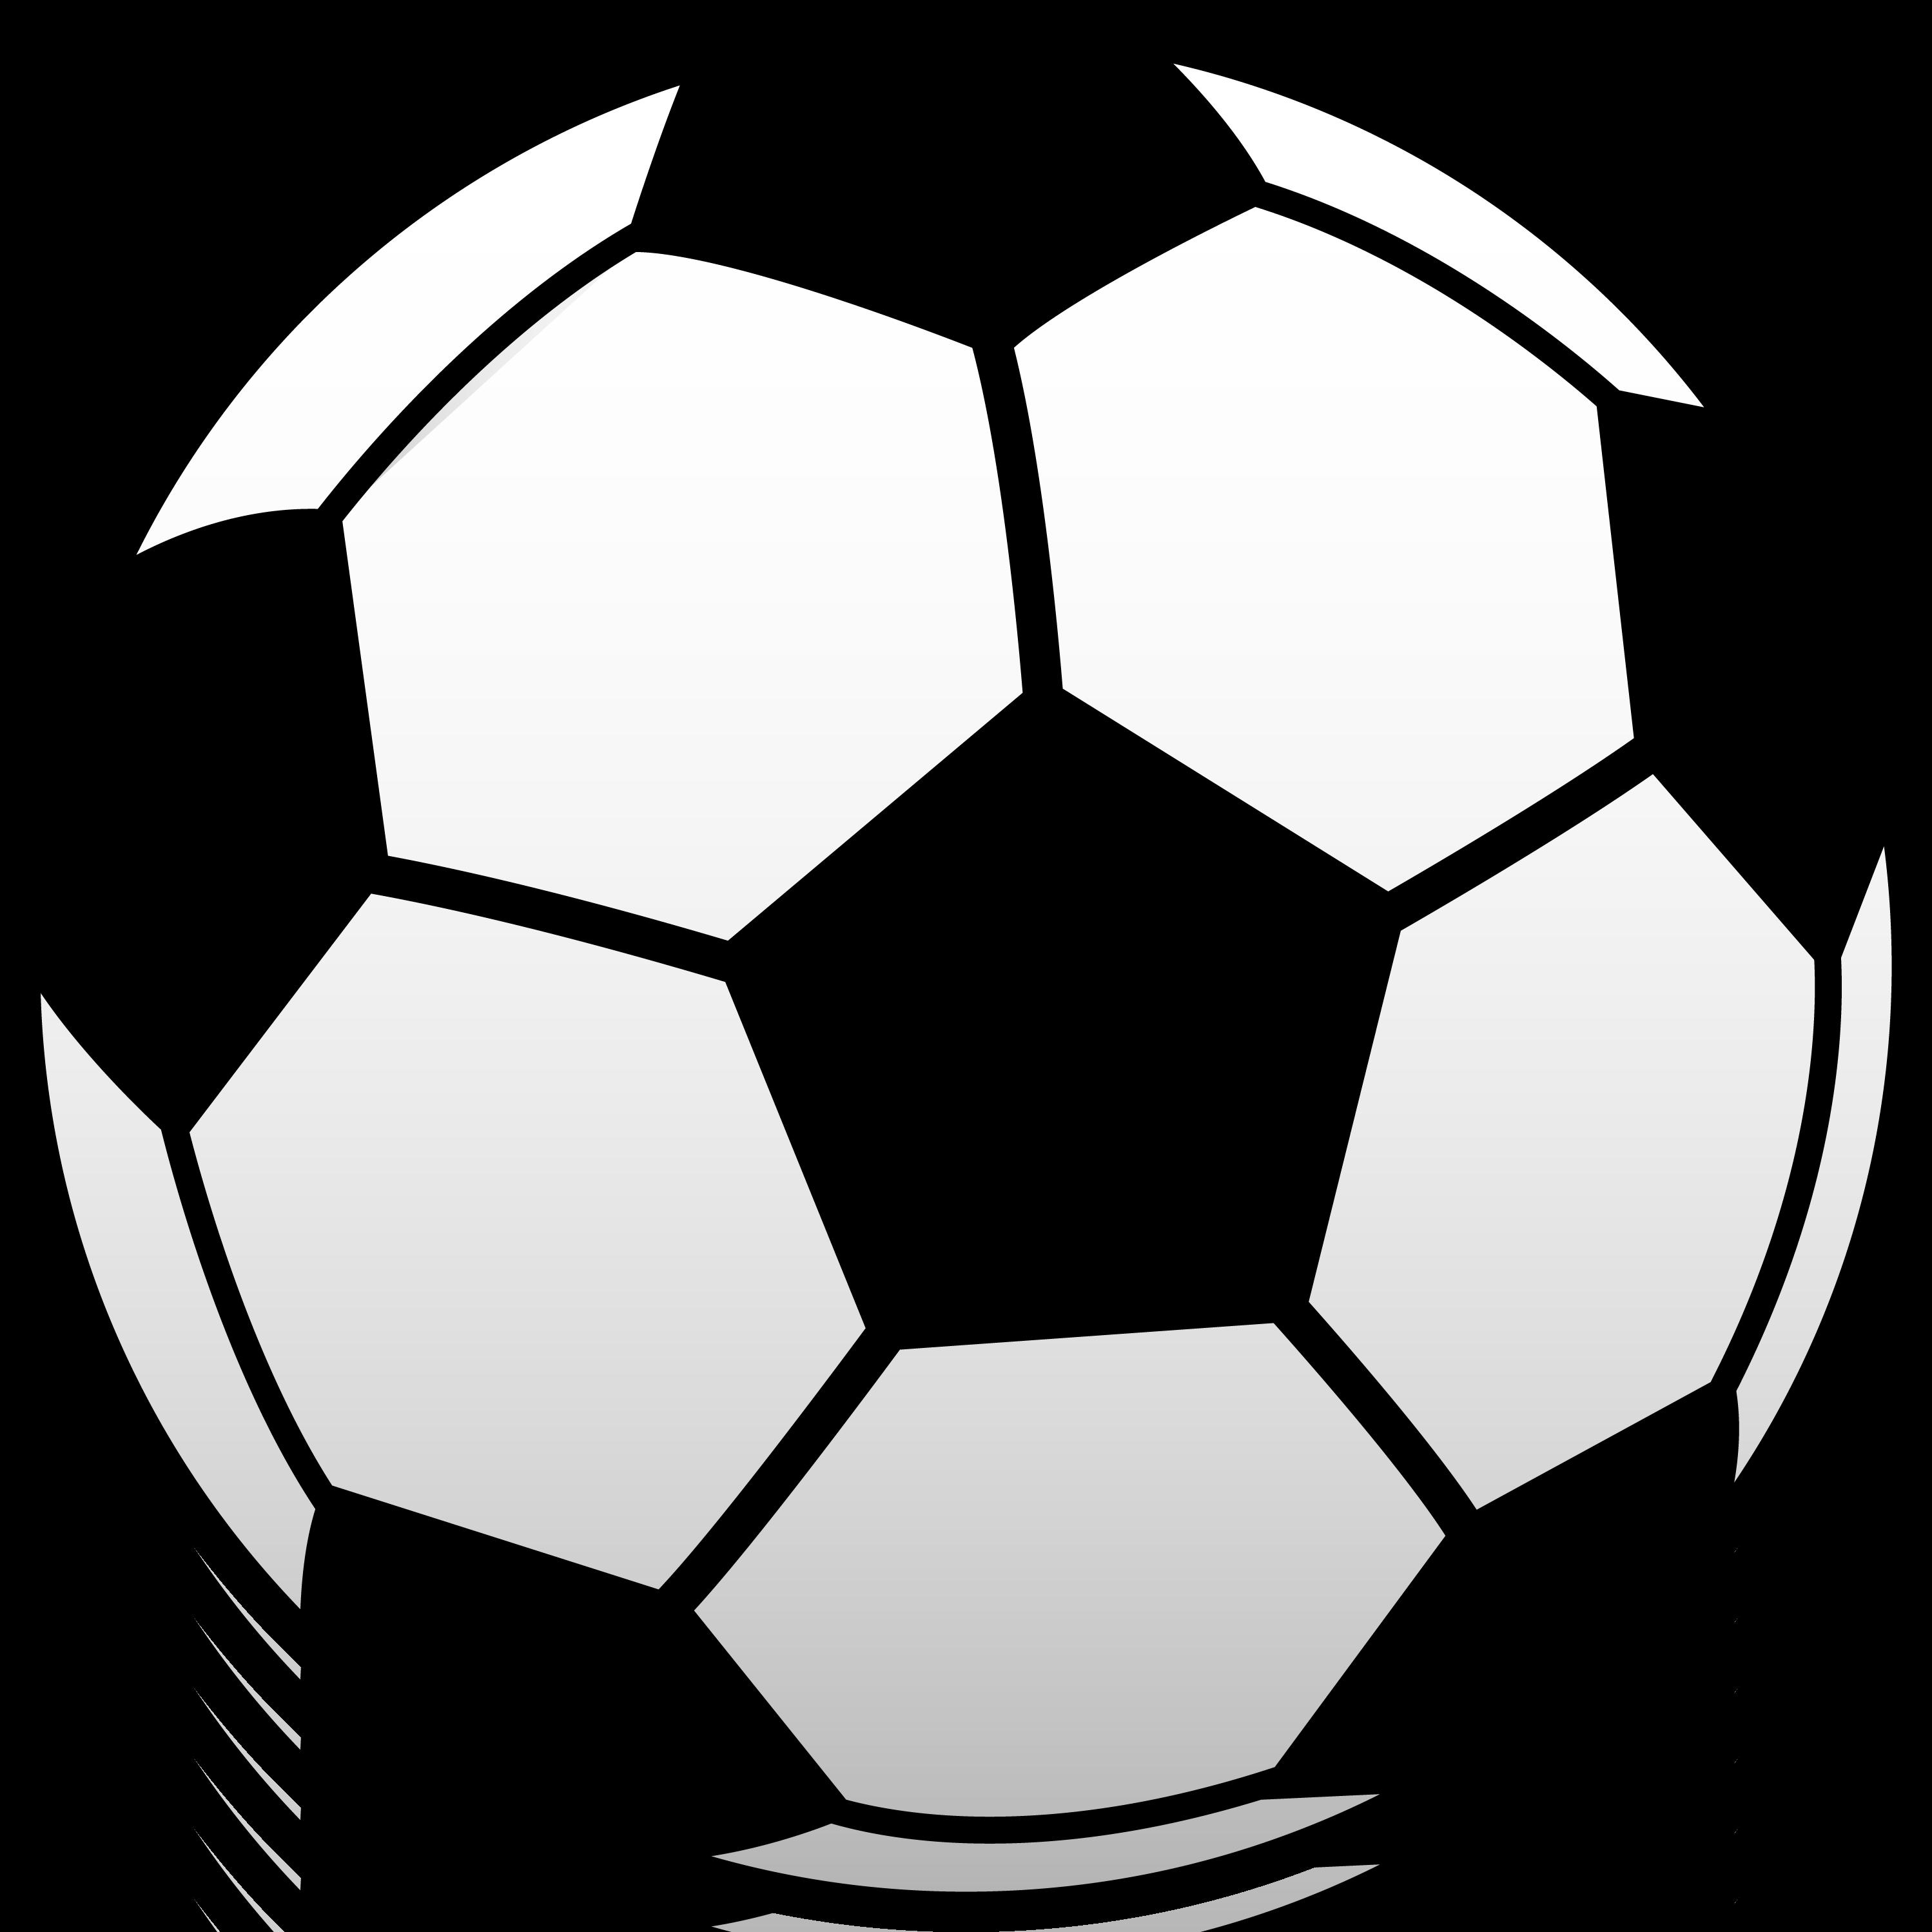 ball clipart-ball clipart-1